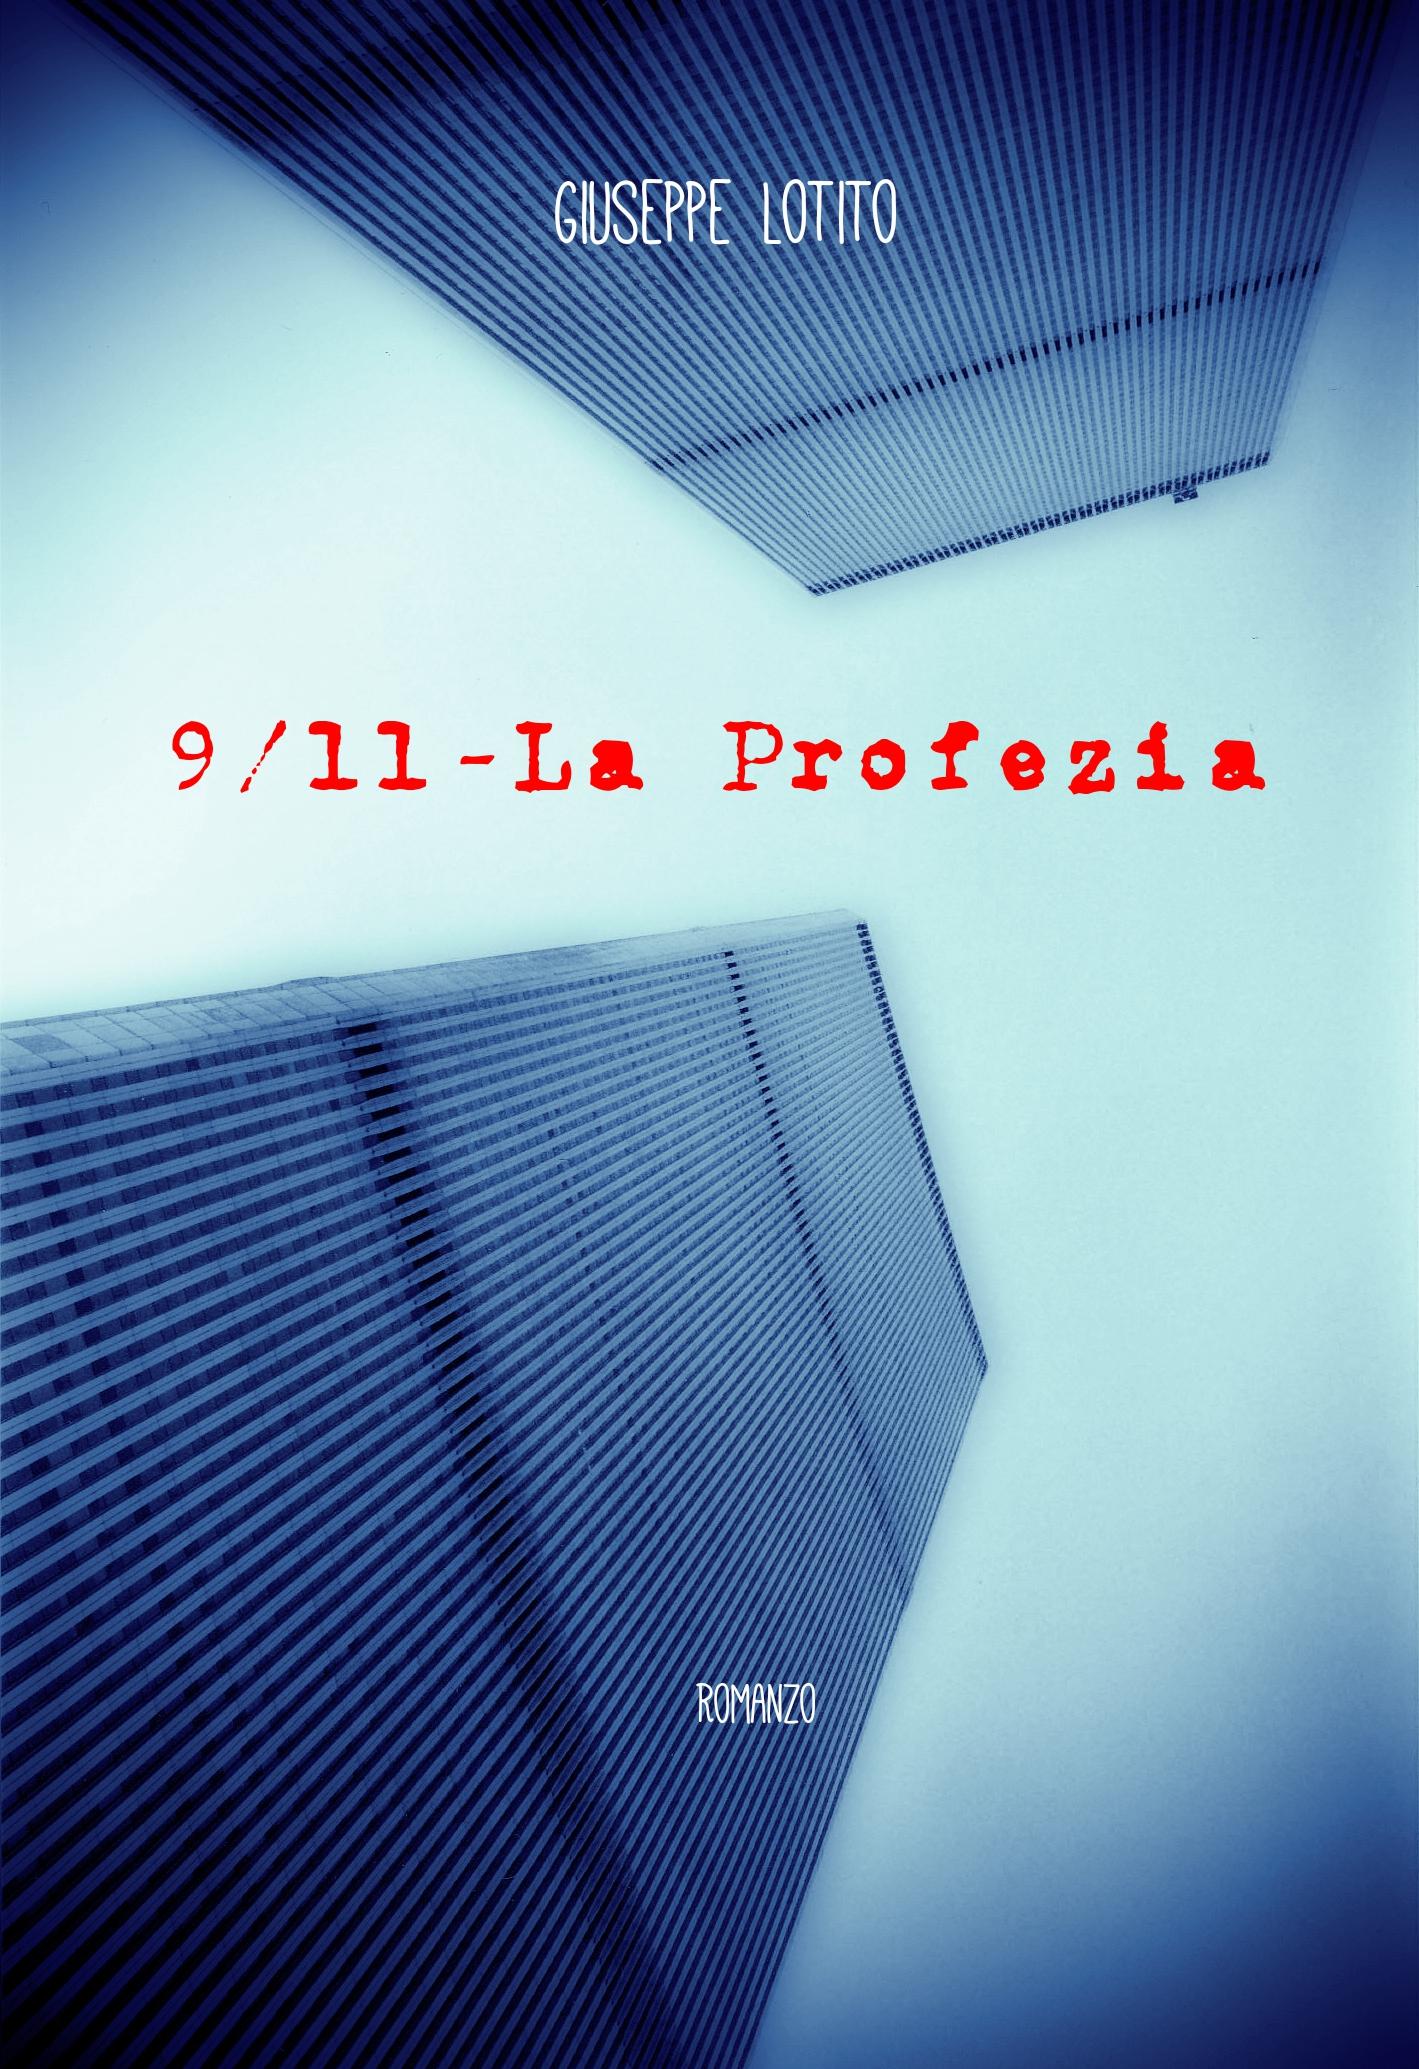 9/11-La Profezia